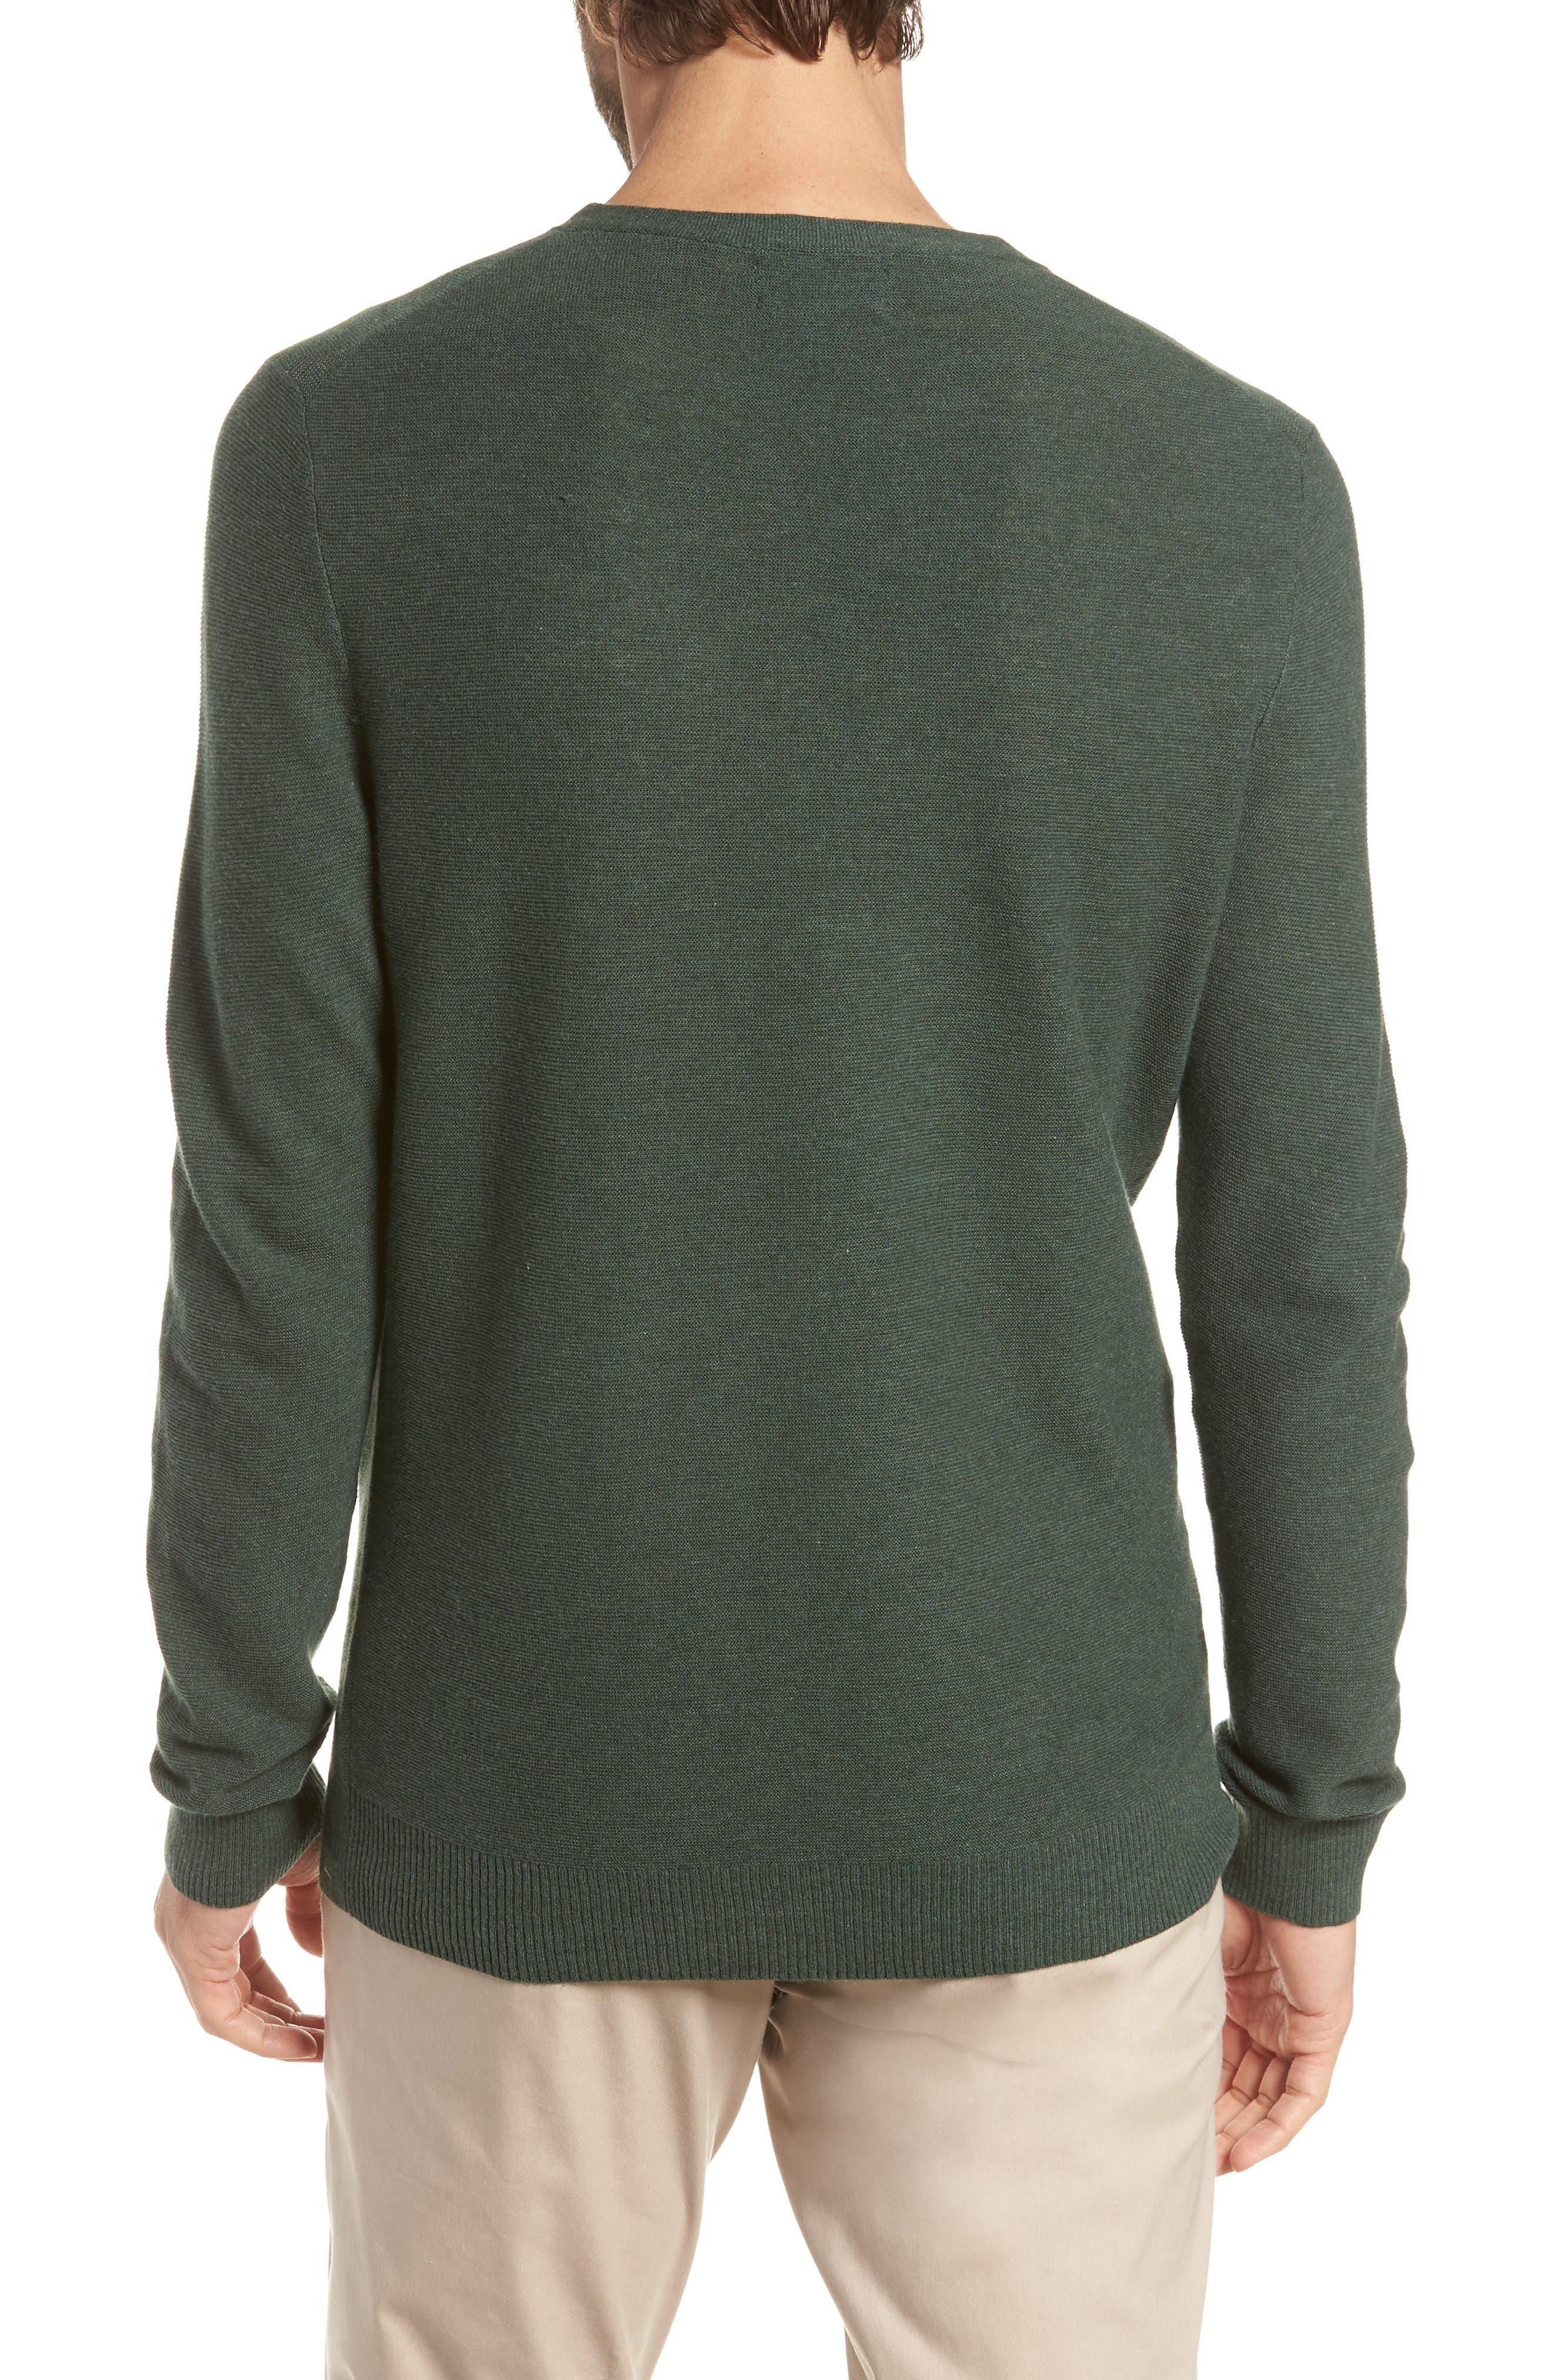 Slim Fit Crewneck Sweater,                             Alternate thumbnail 2, color,                             300